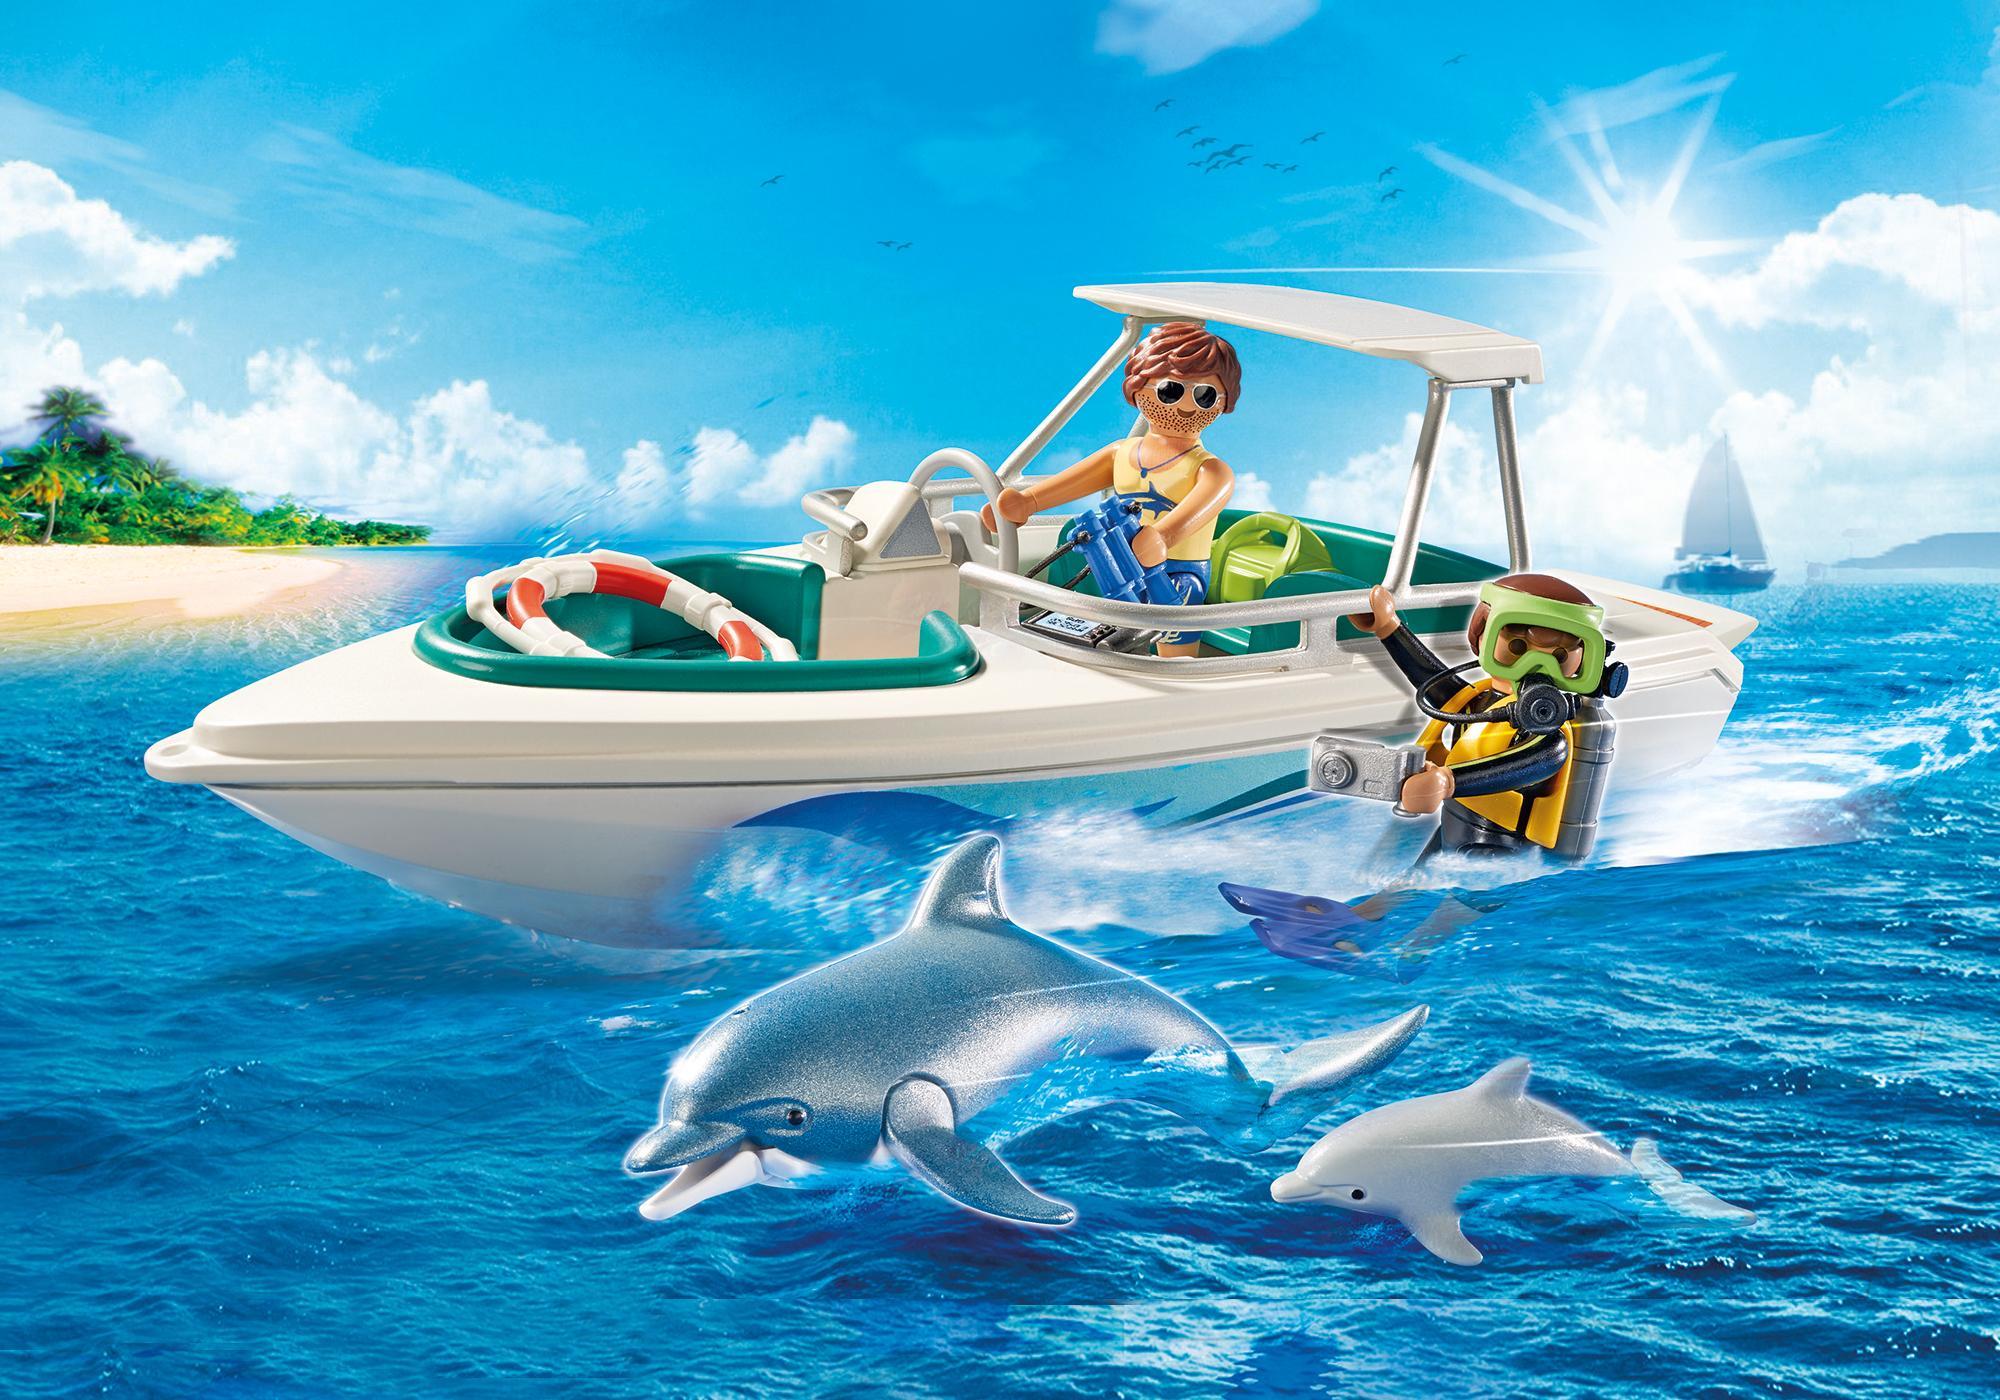 6981_product_detail/Ταχύπλοο με δύτη και δελφίνια